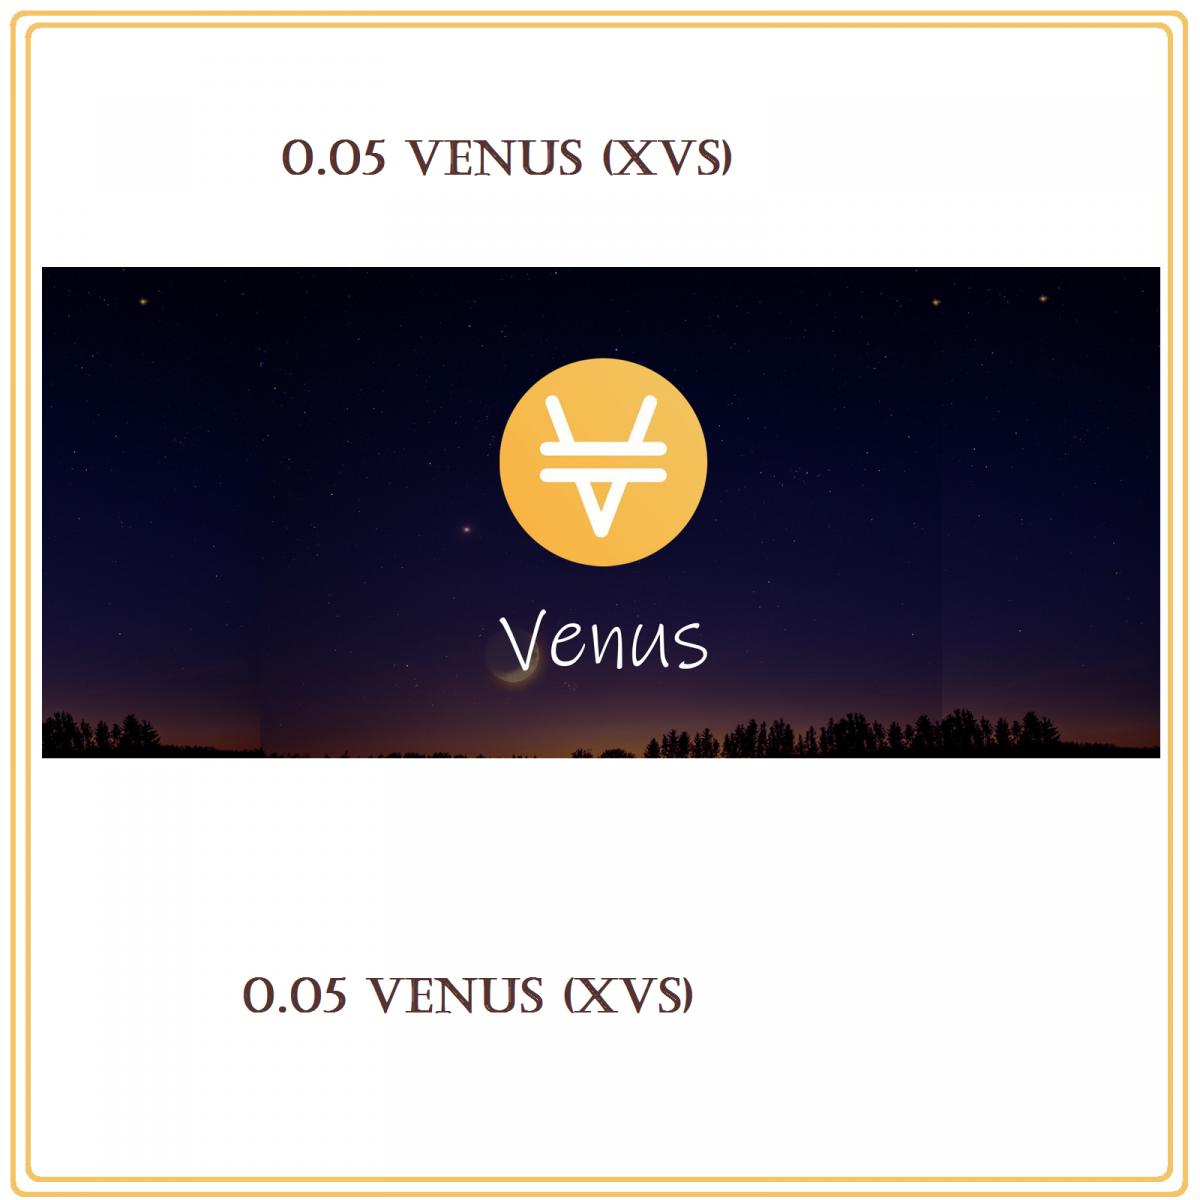 0.05 Venus (XVS) Mining Contract